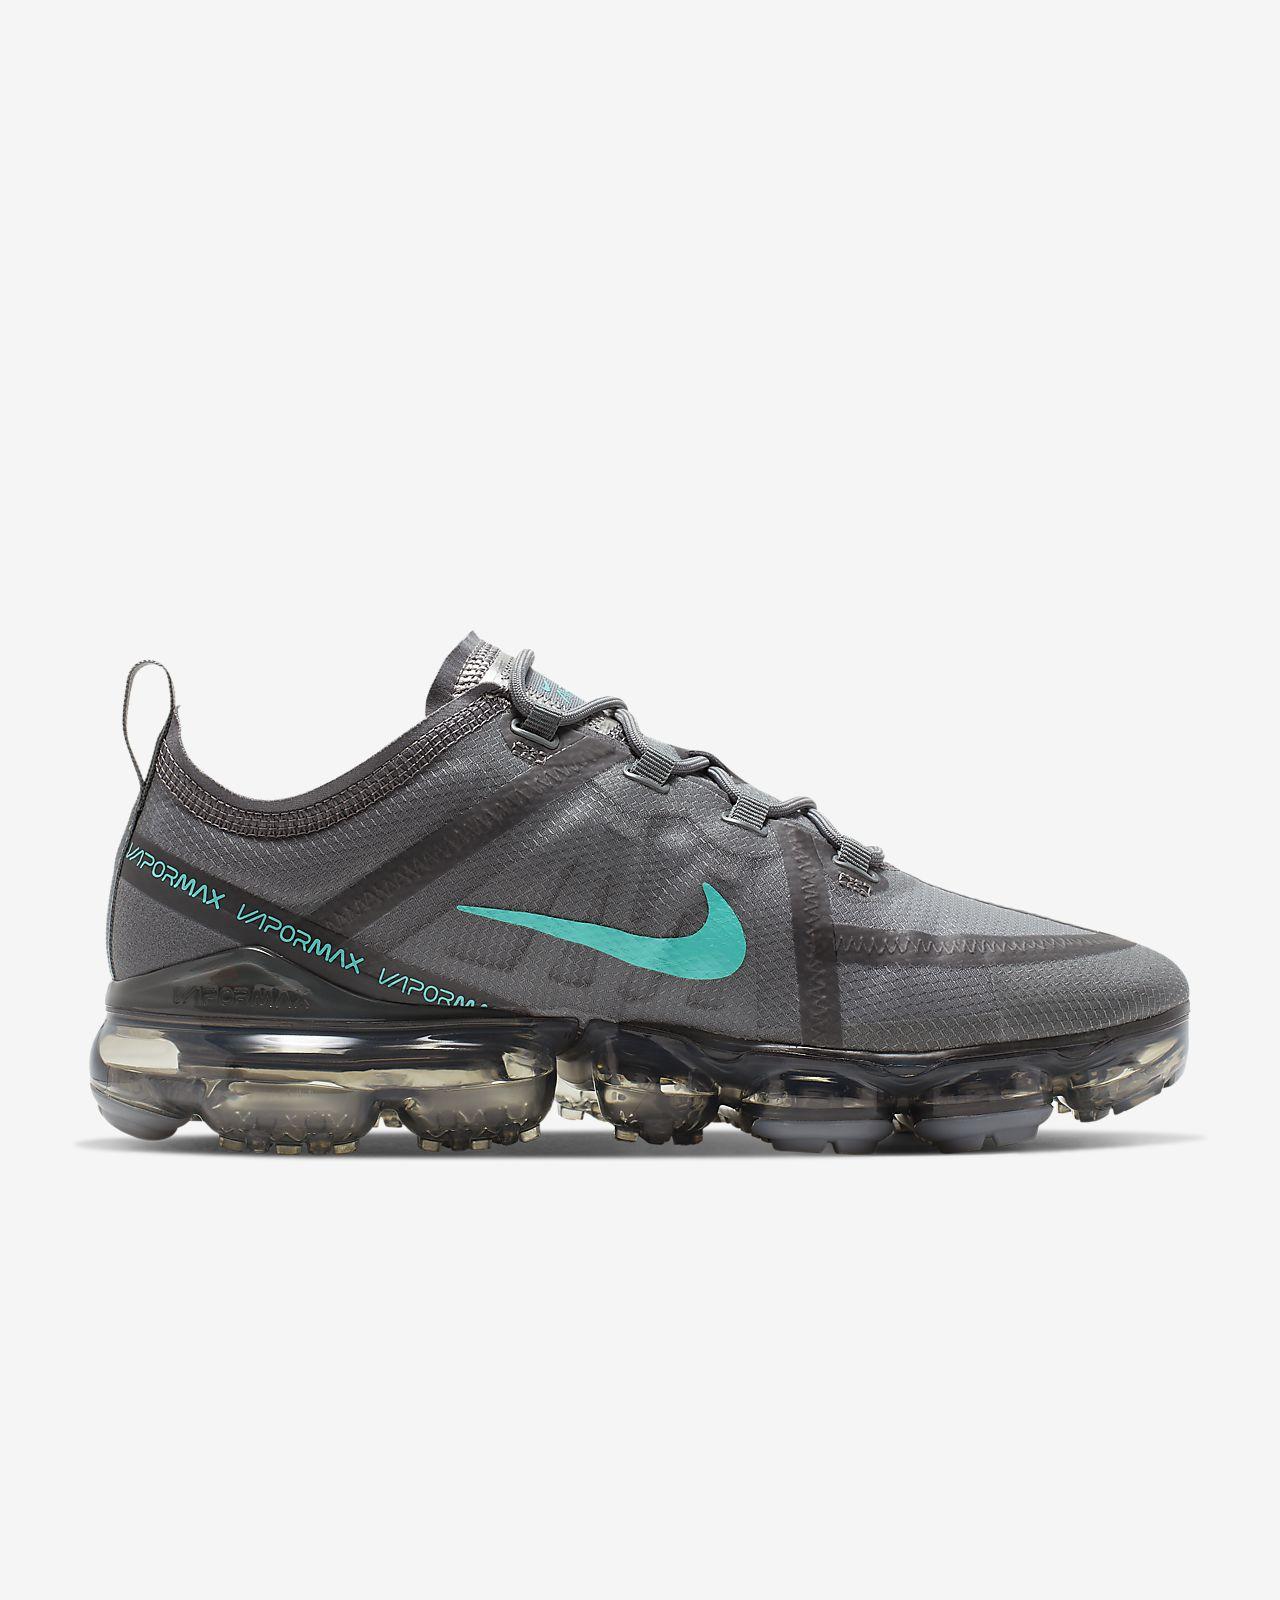 vapormax scarpe nike uomo